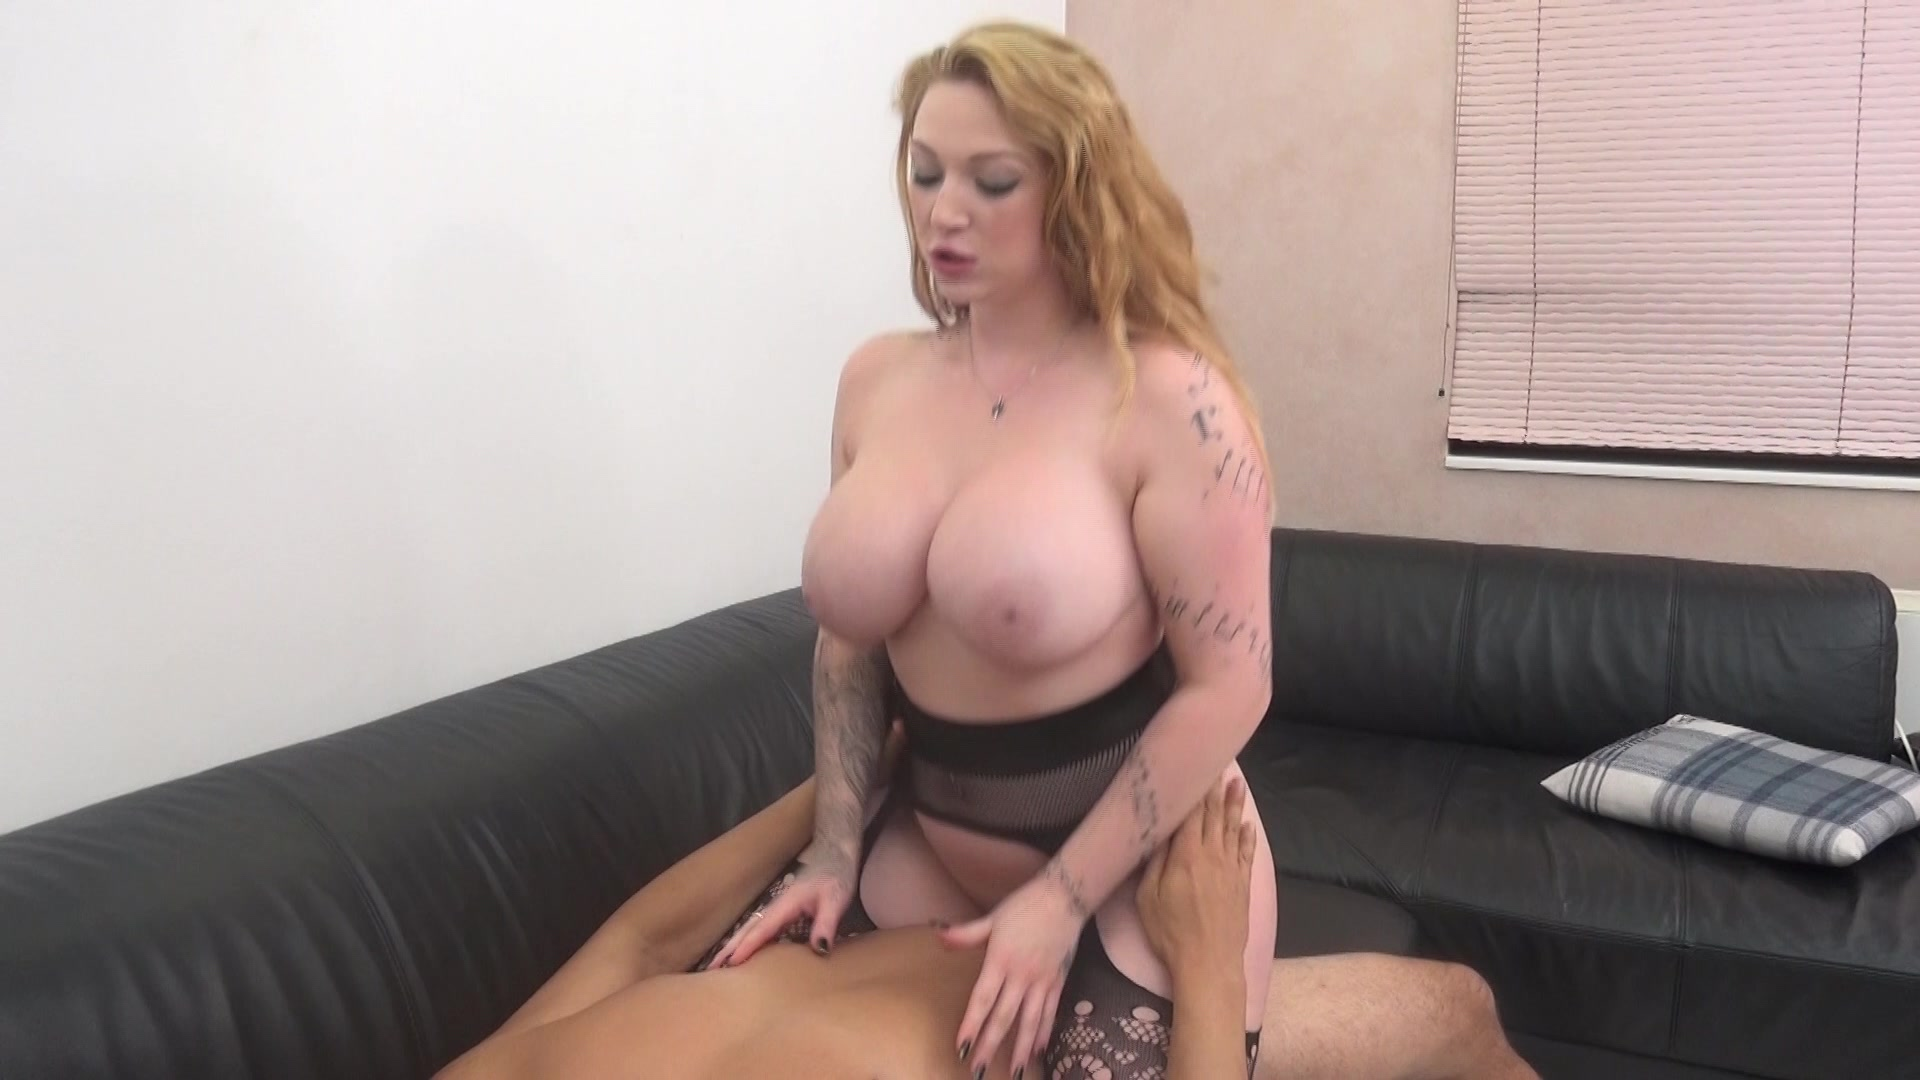 Close up nude videos